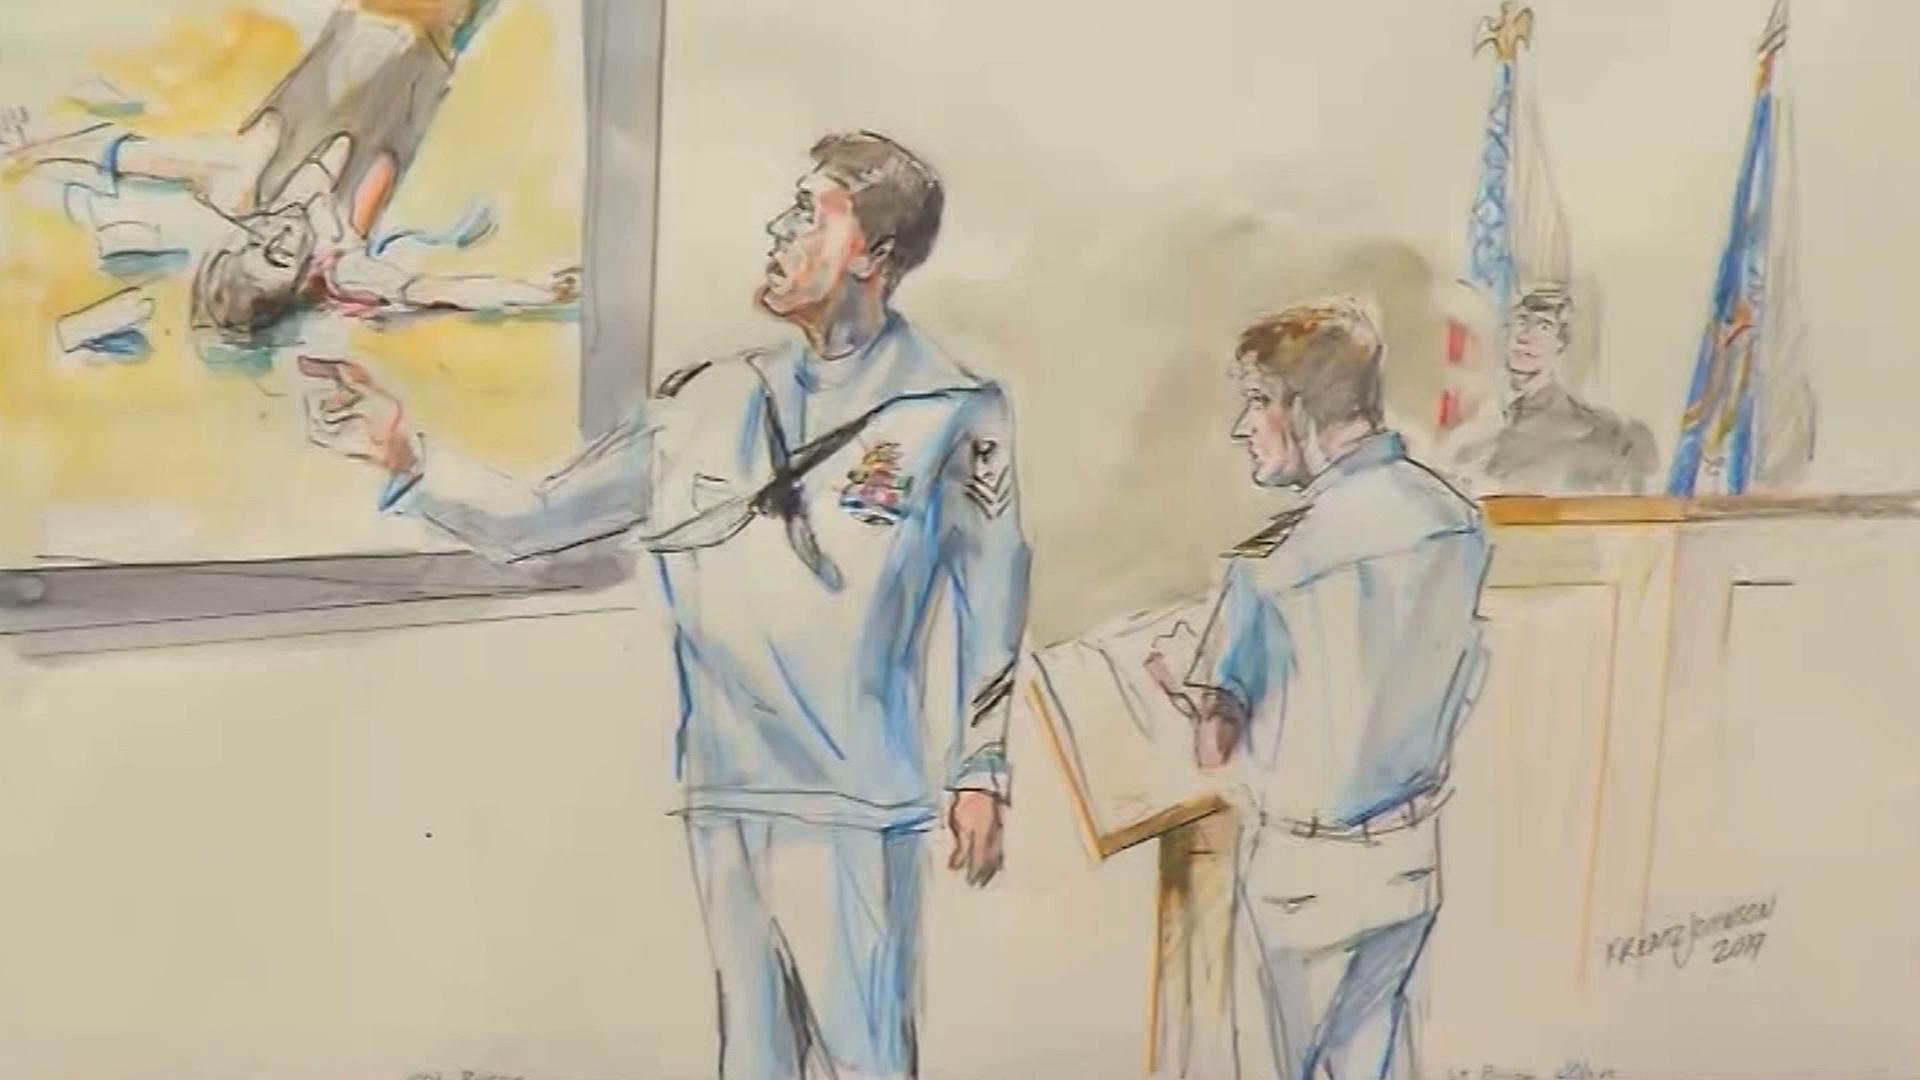 Witness Corey Scott, a medic, testifies during the war crimes trial for Navy SEAL Edward Gallagher in San Diego on June 20, 2019. (Credit: Krentz Johnson via CNN)